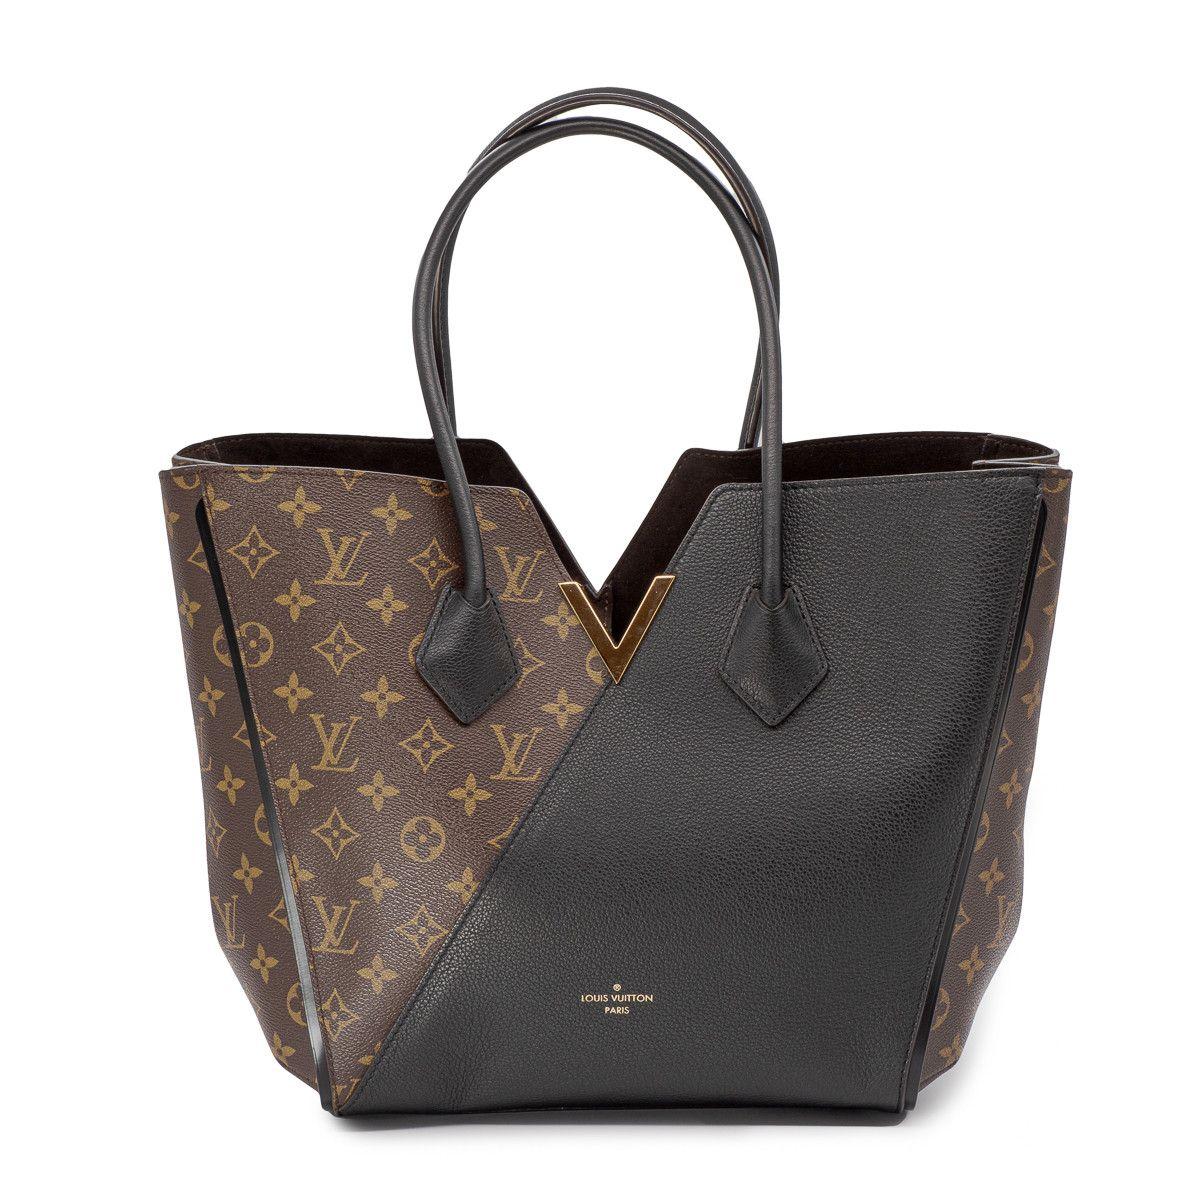 Sac Kimono Toile Monogram et cuir noir. | Louis vuitton bag ...